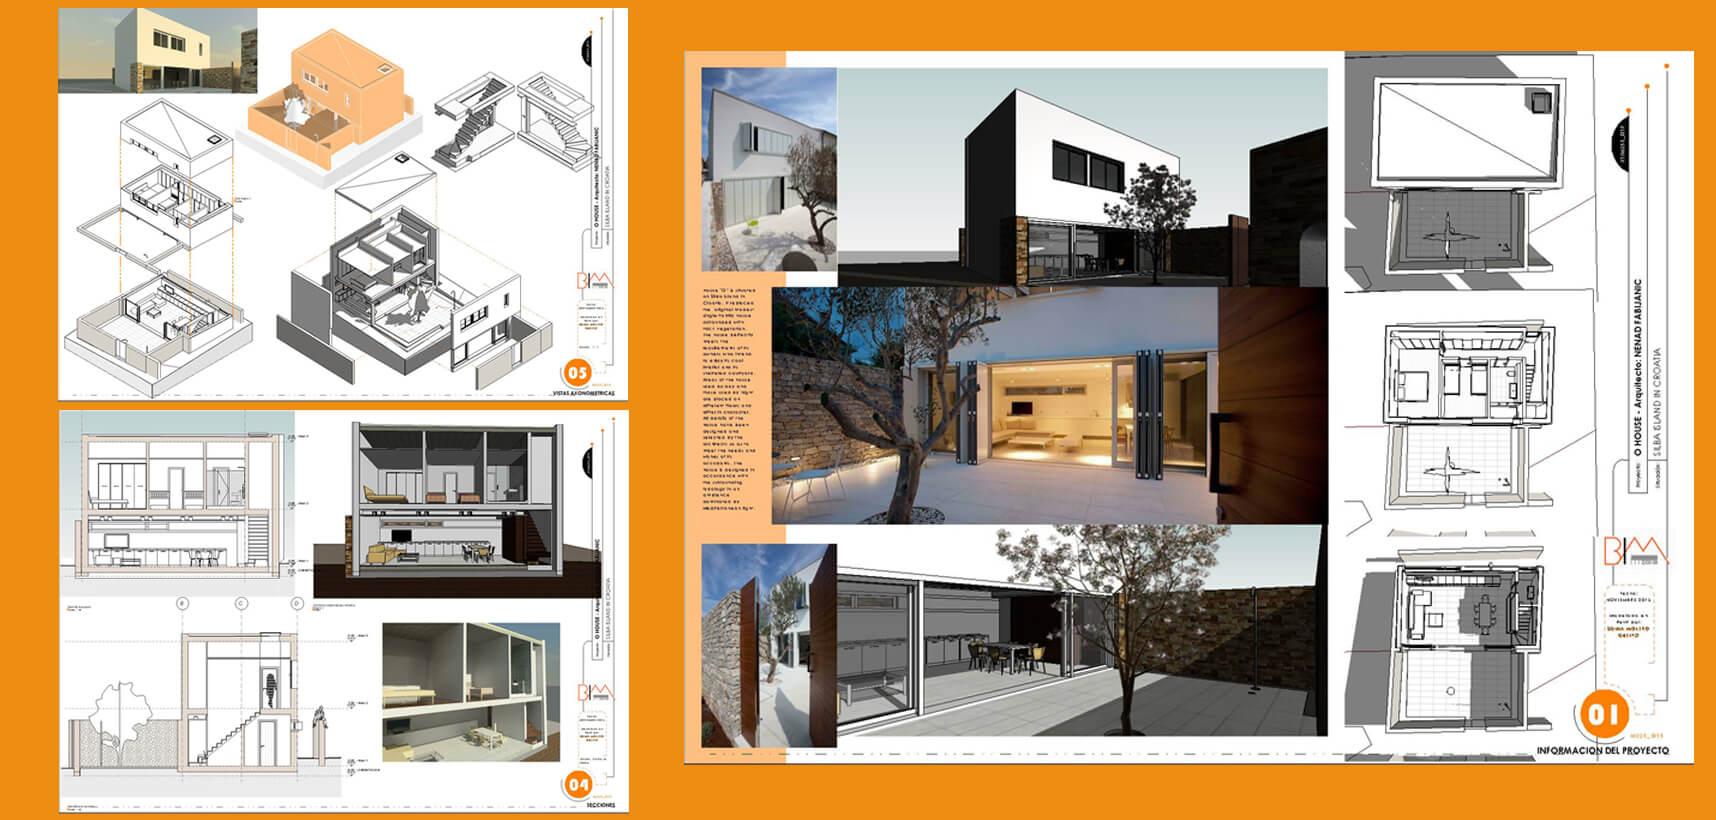 Proyecto BIM O HOUSE